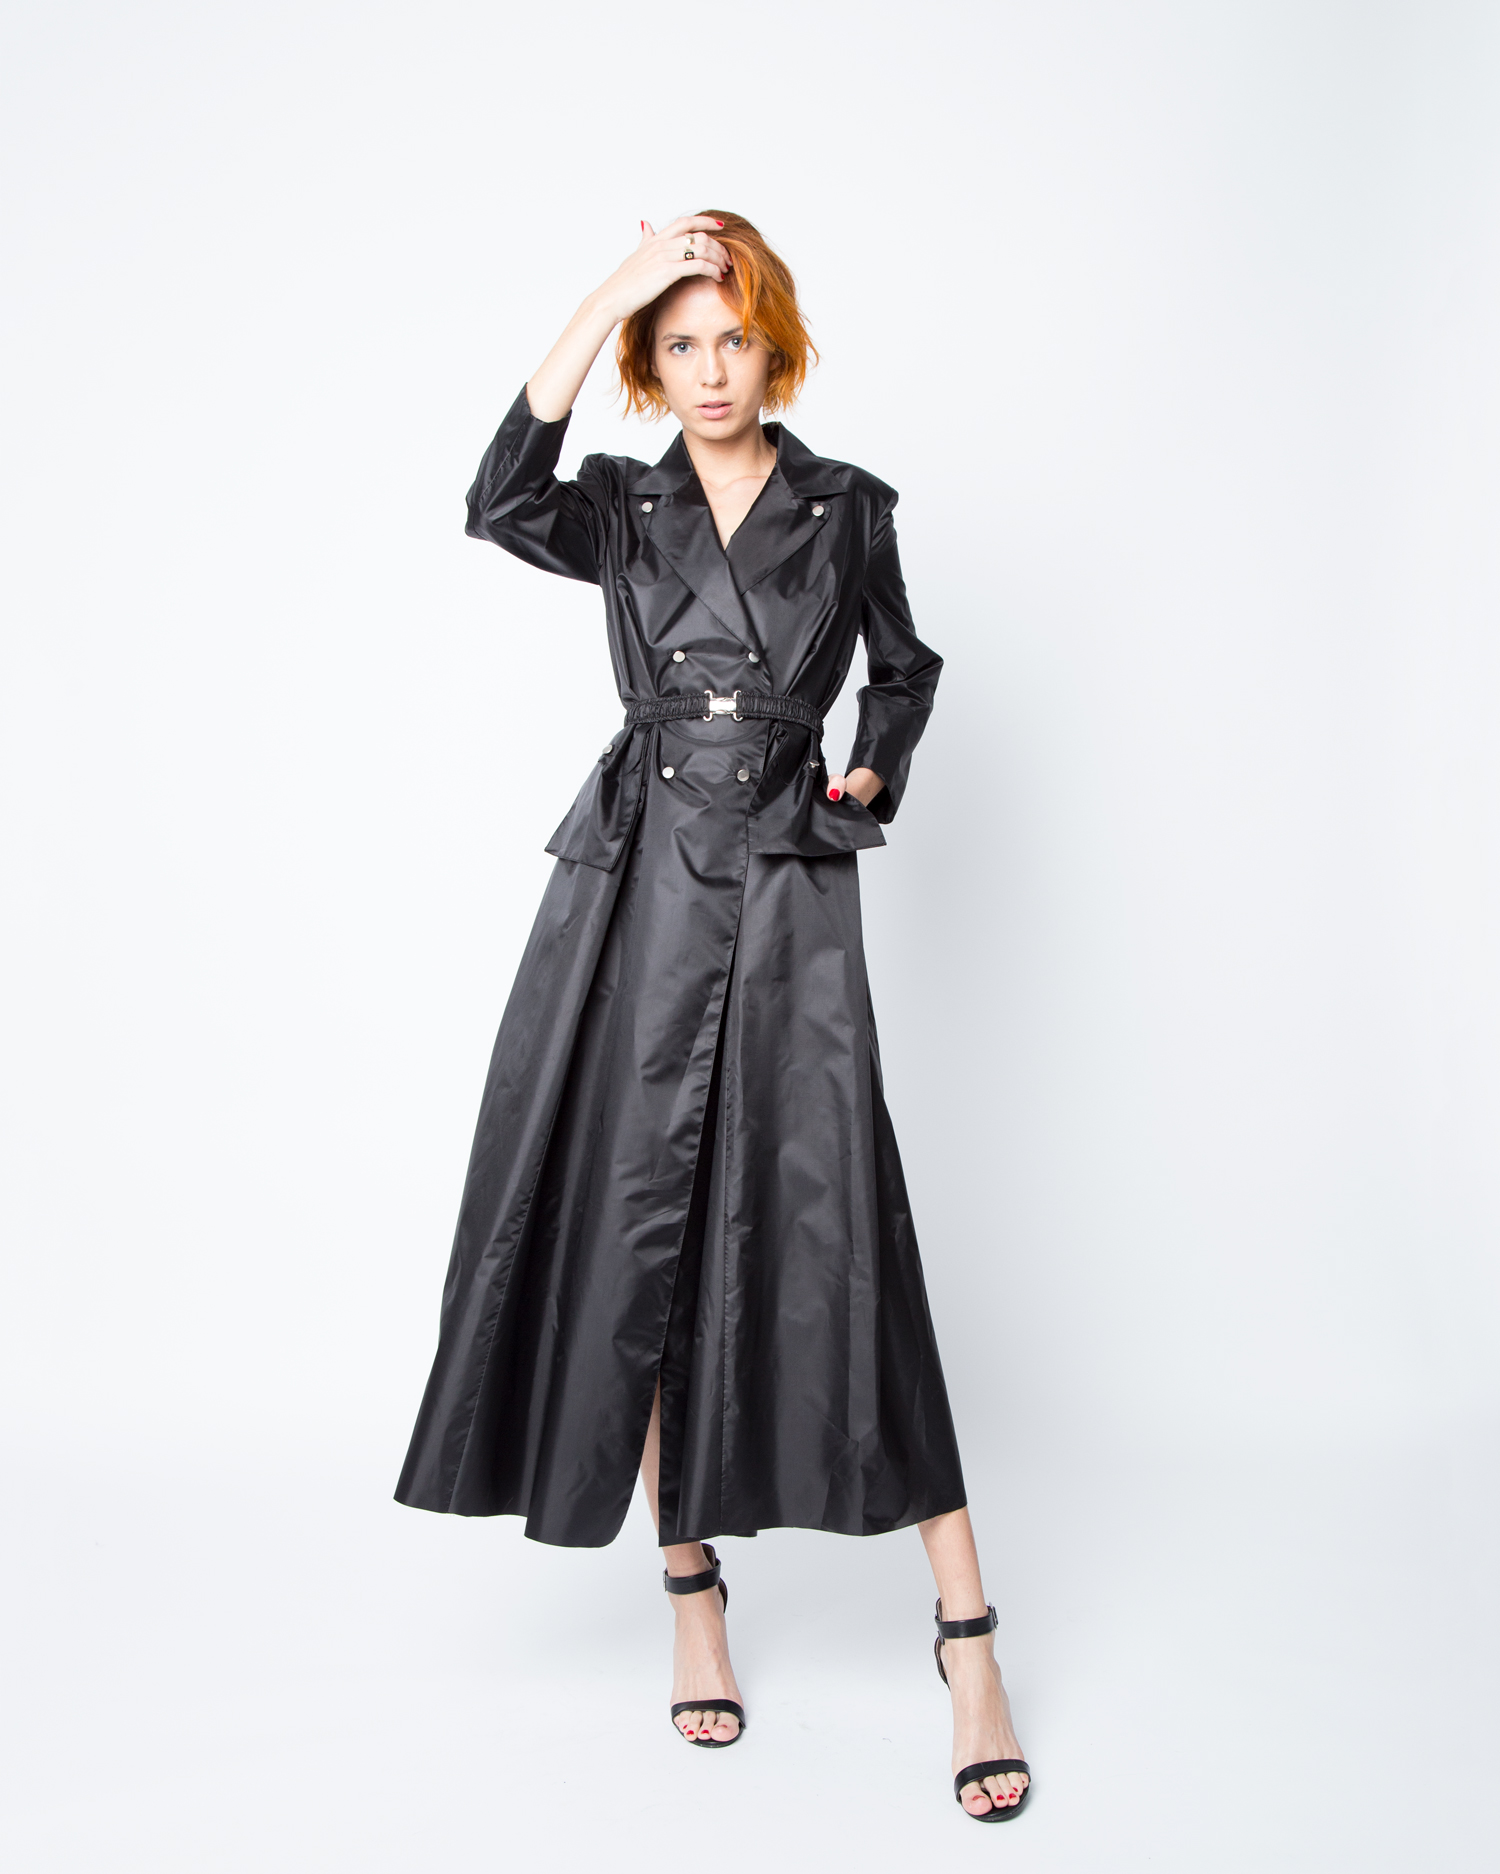 olya-kosterina-ss18-trench-dress-01.jpg